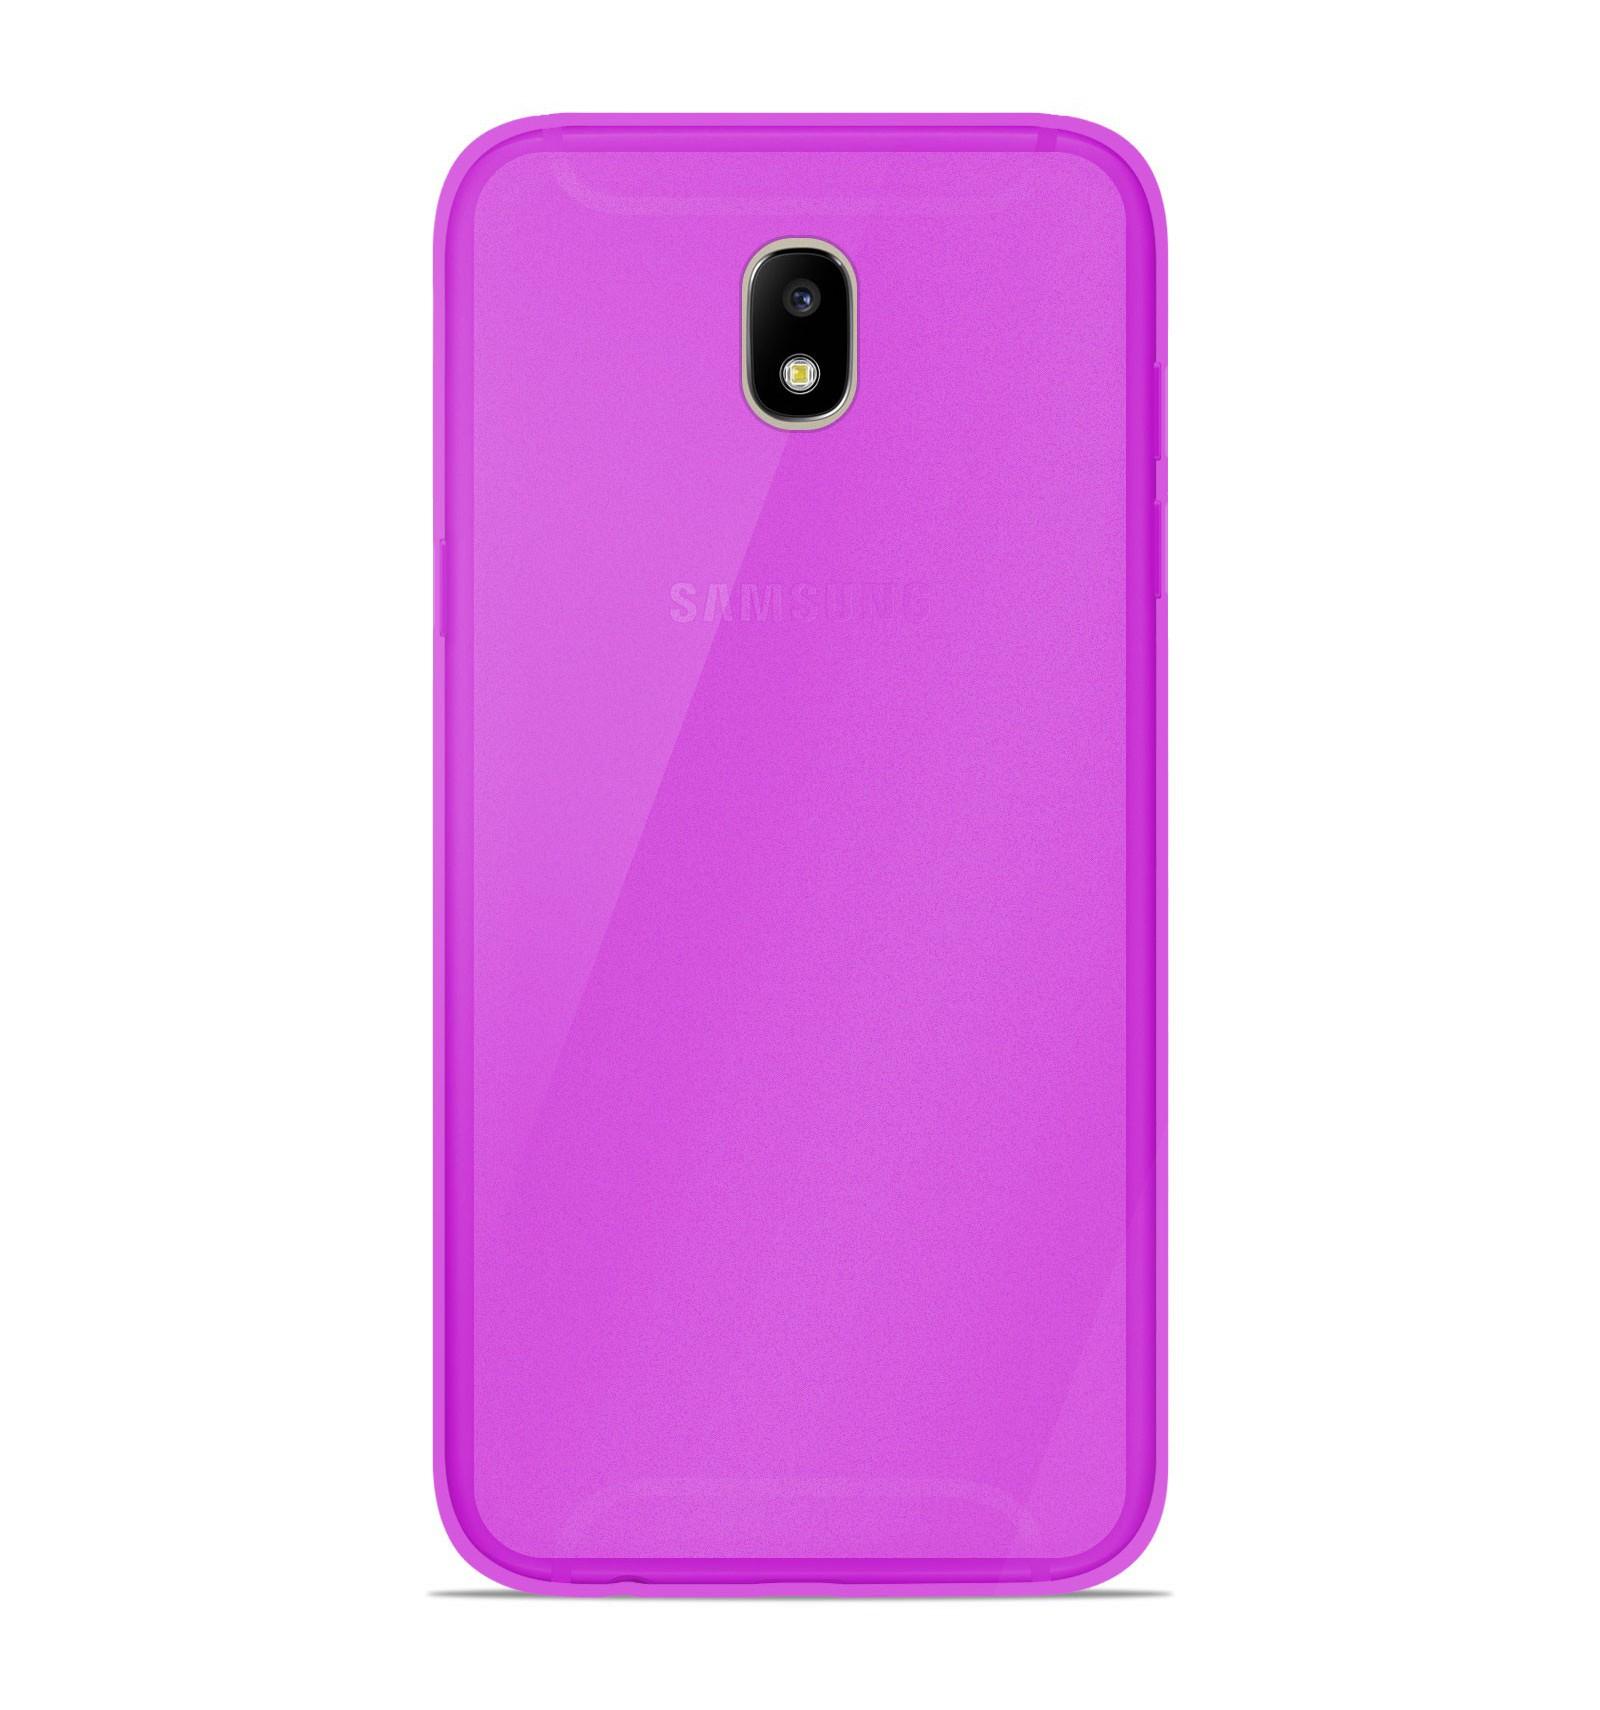 coque samsung galaxy j7 2017 silicone gel givr violet translucide. Black Bedroom Furniture Sets. Home Design Ideas